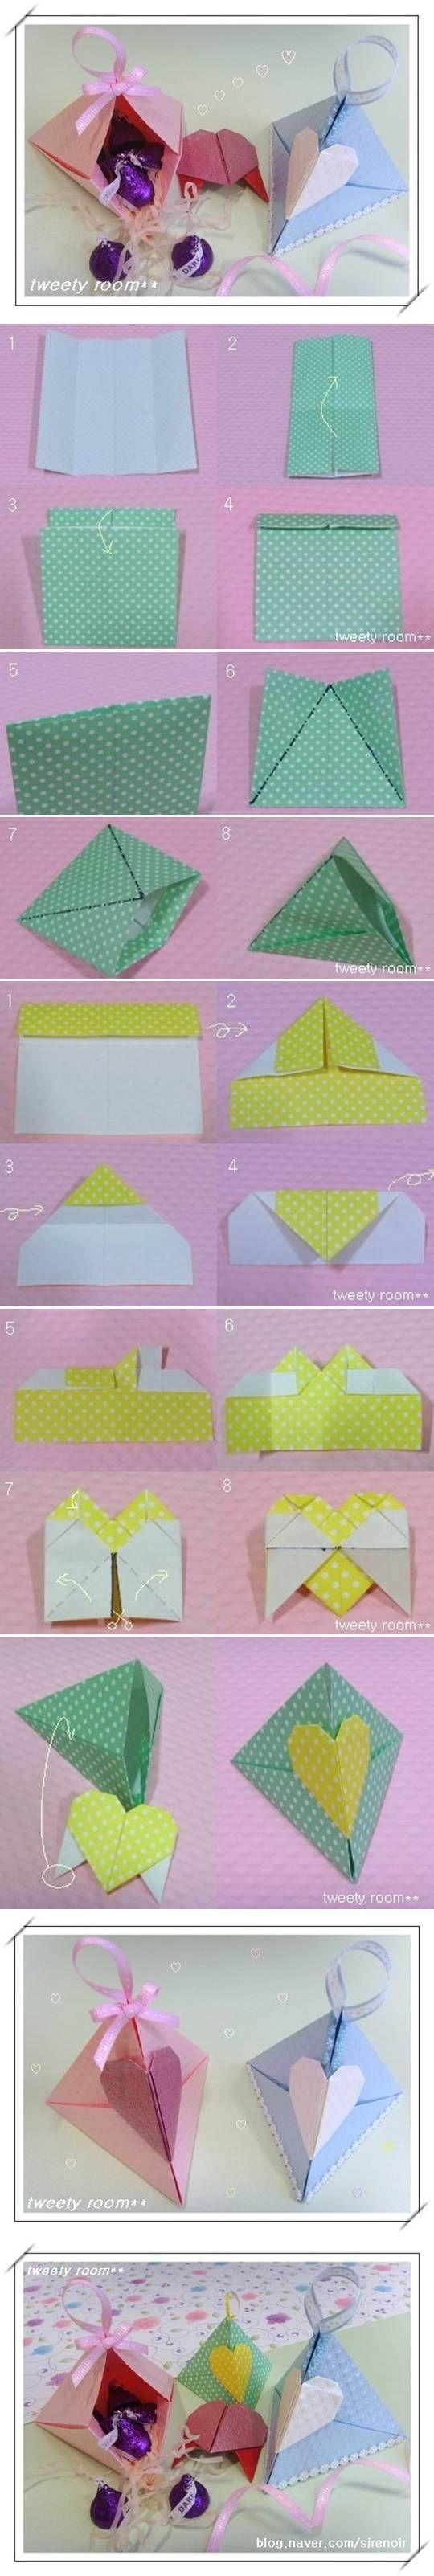 DIY Triangle Heart Lock Gift Box